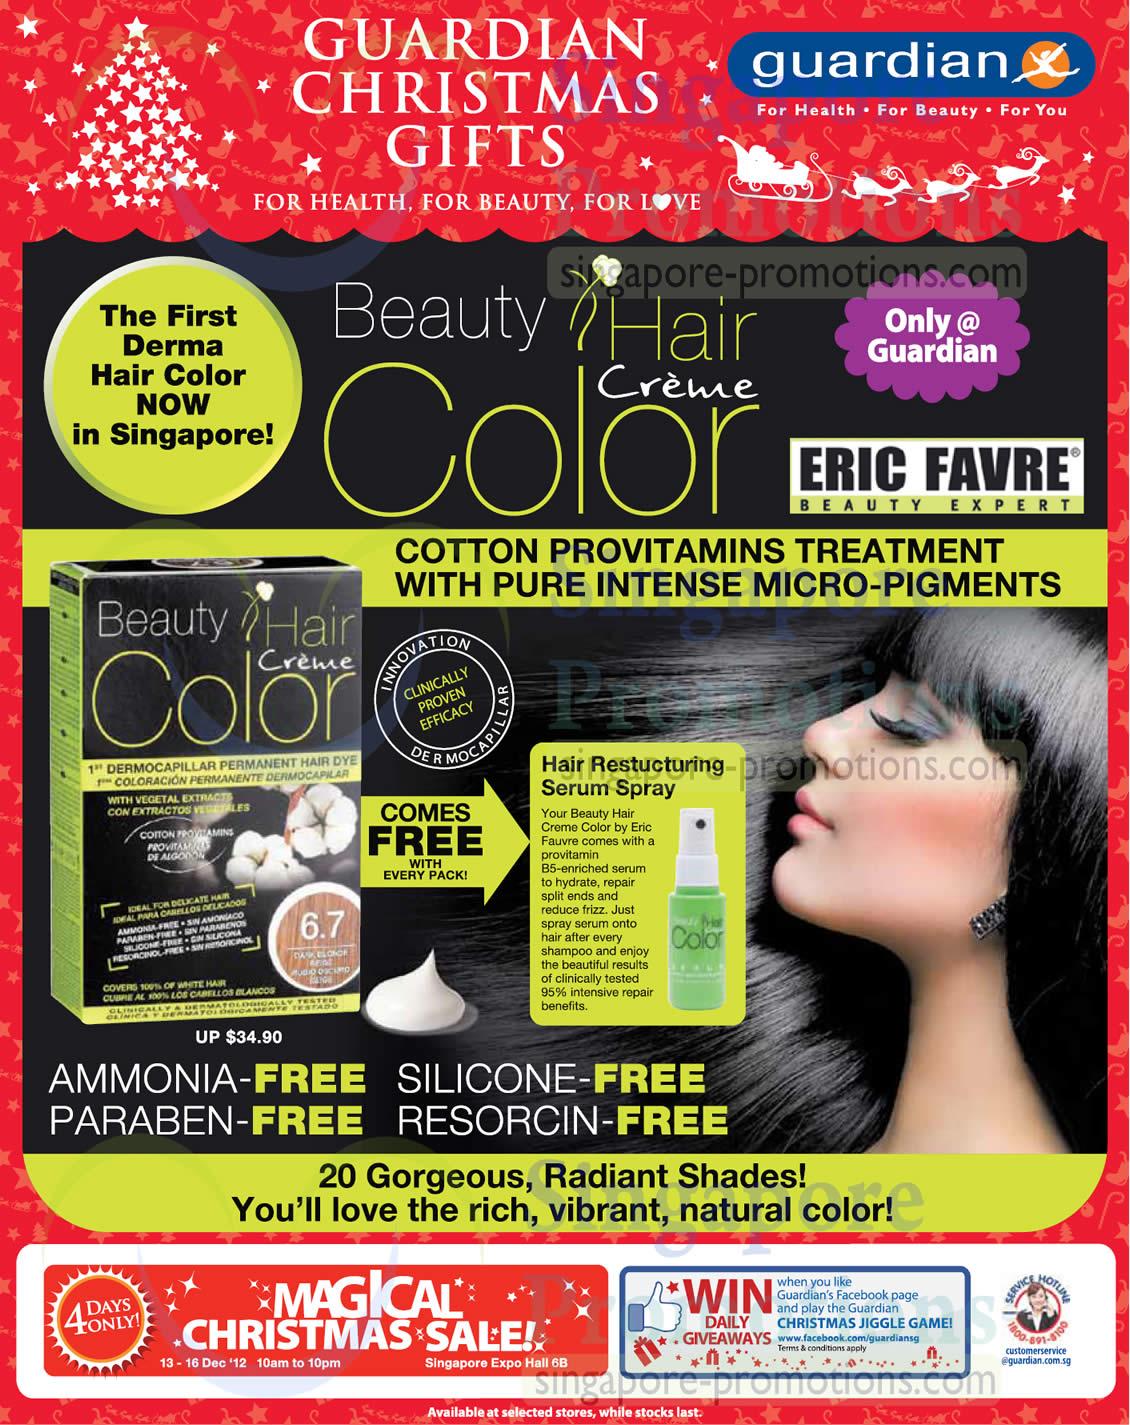 Beauty Hair Creme Color